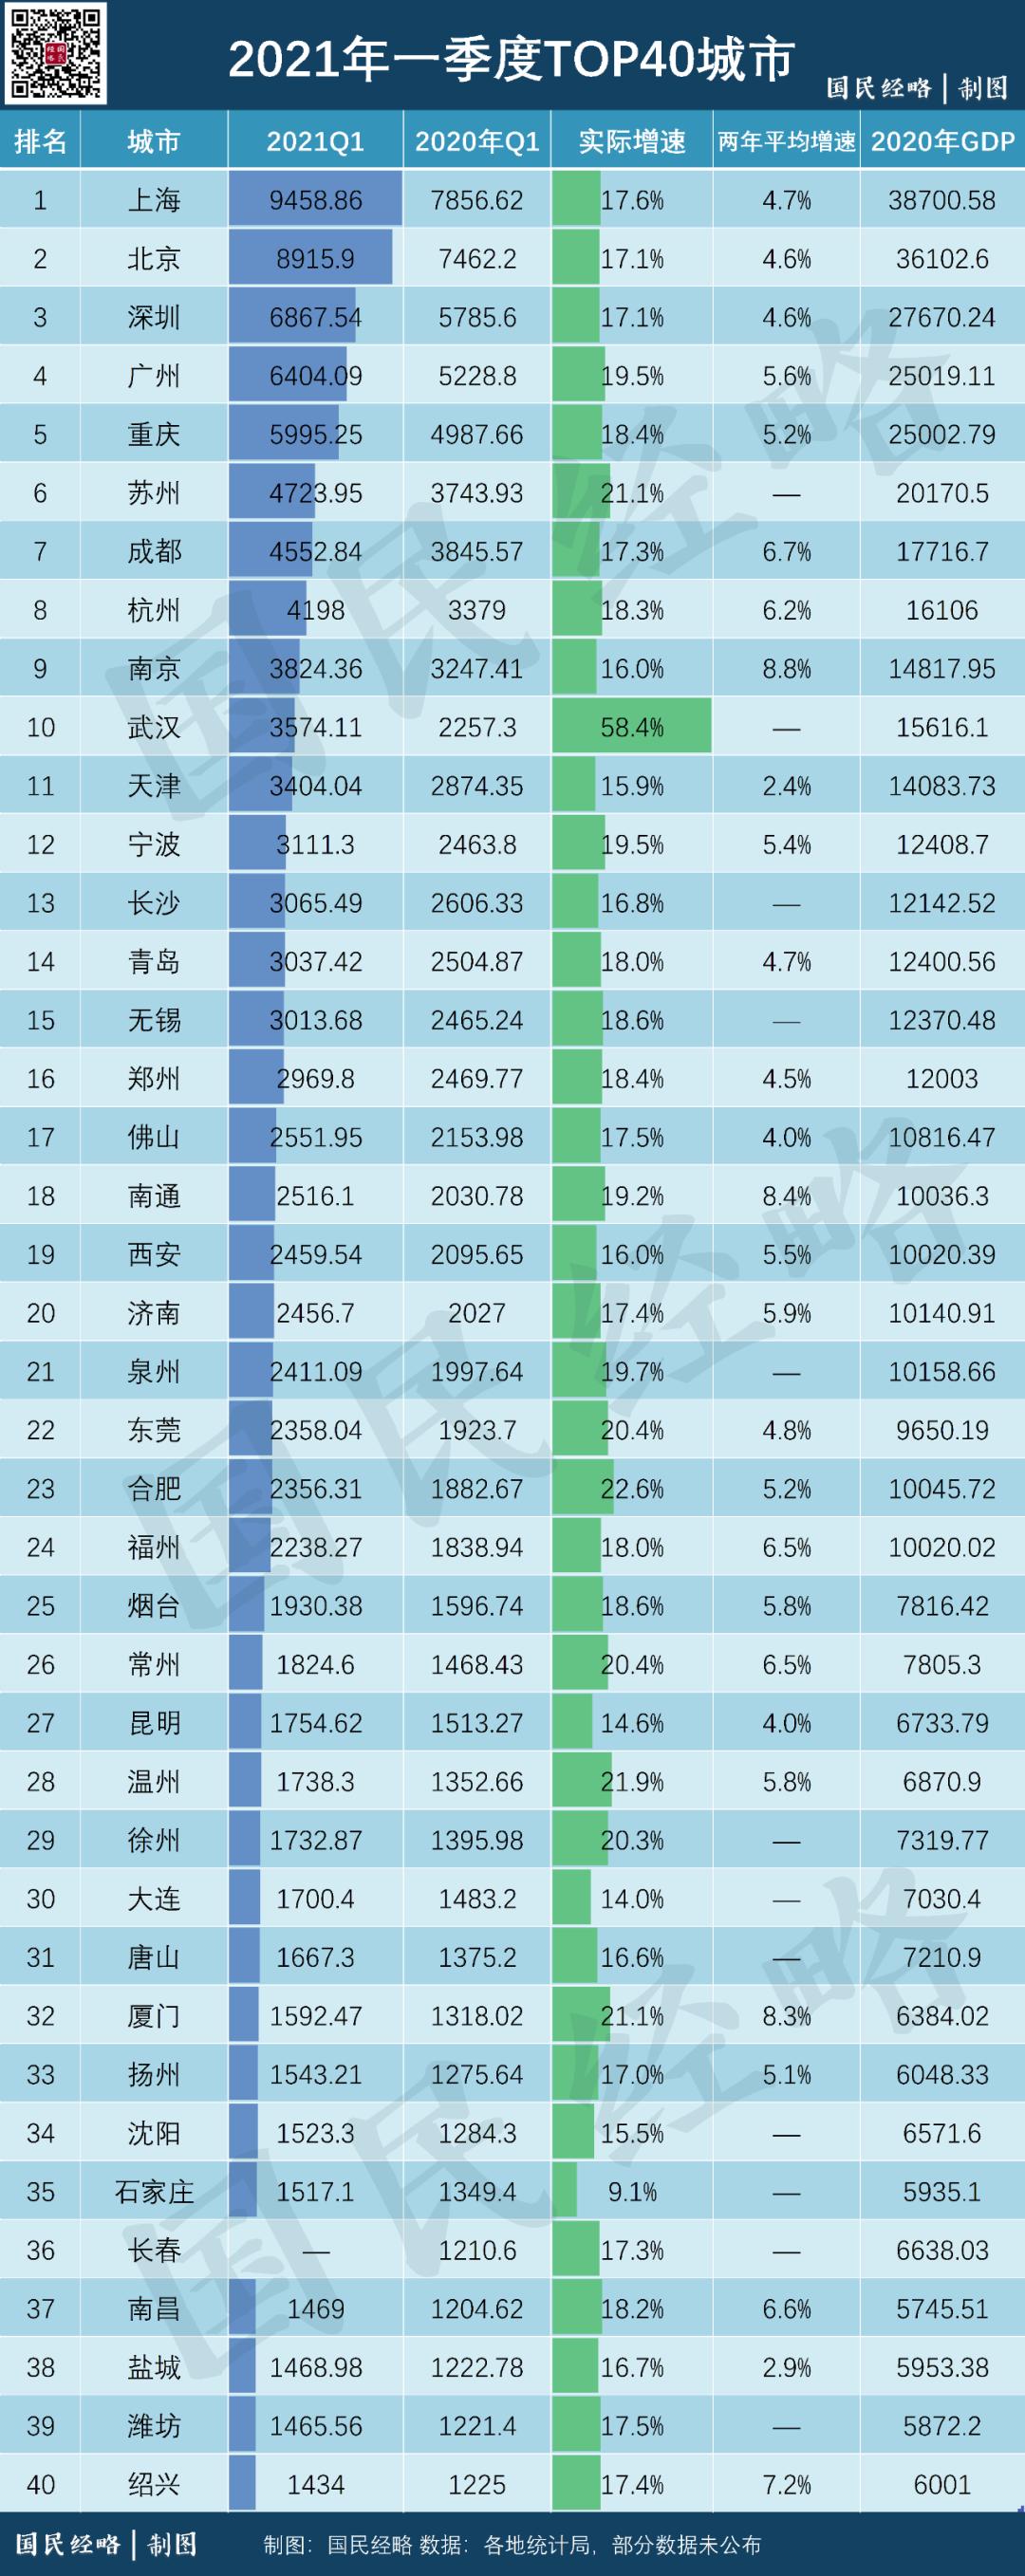 北京gdp_2021年,最新TOP40城市GDP排行榜